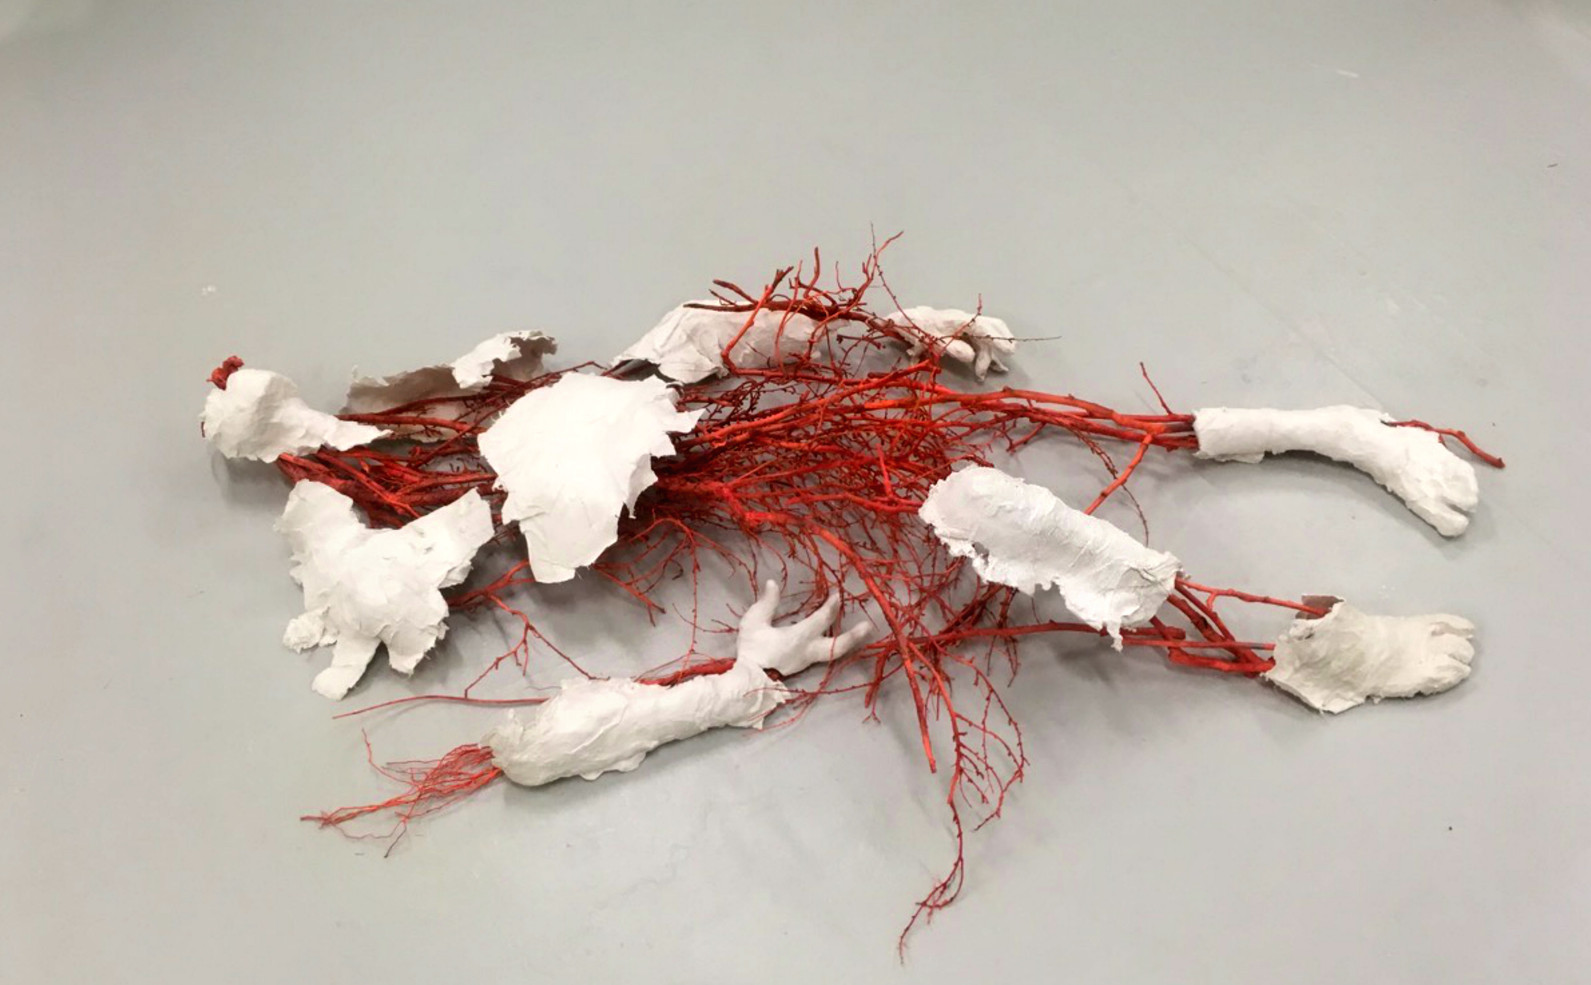 AskEmblaSculpture1.jpg